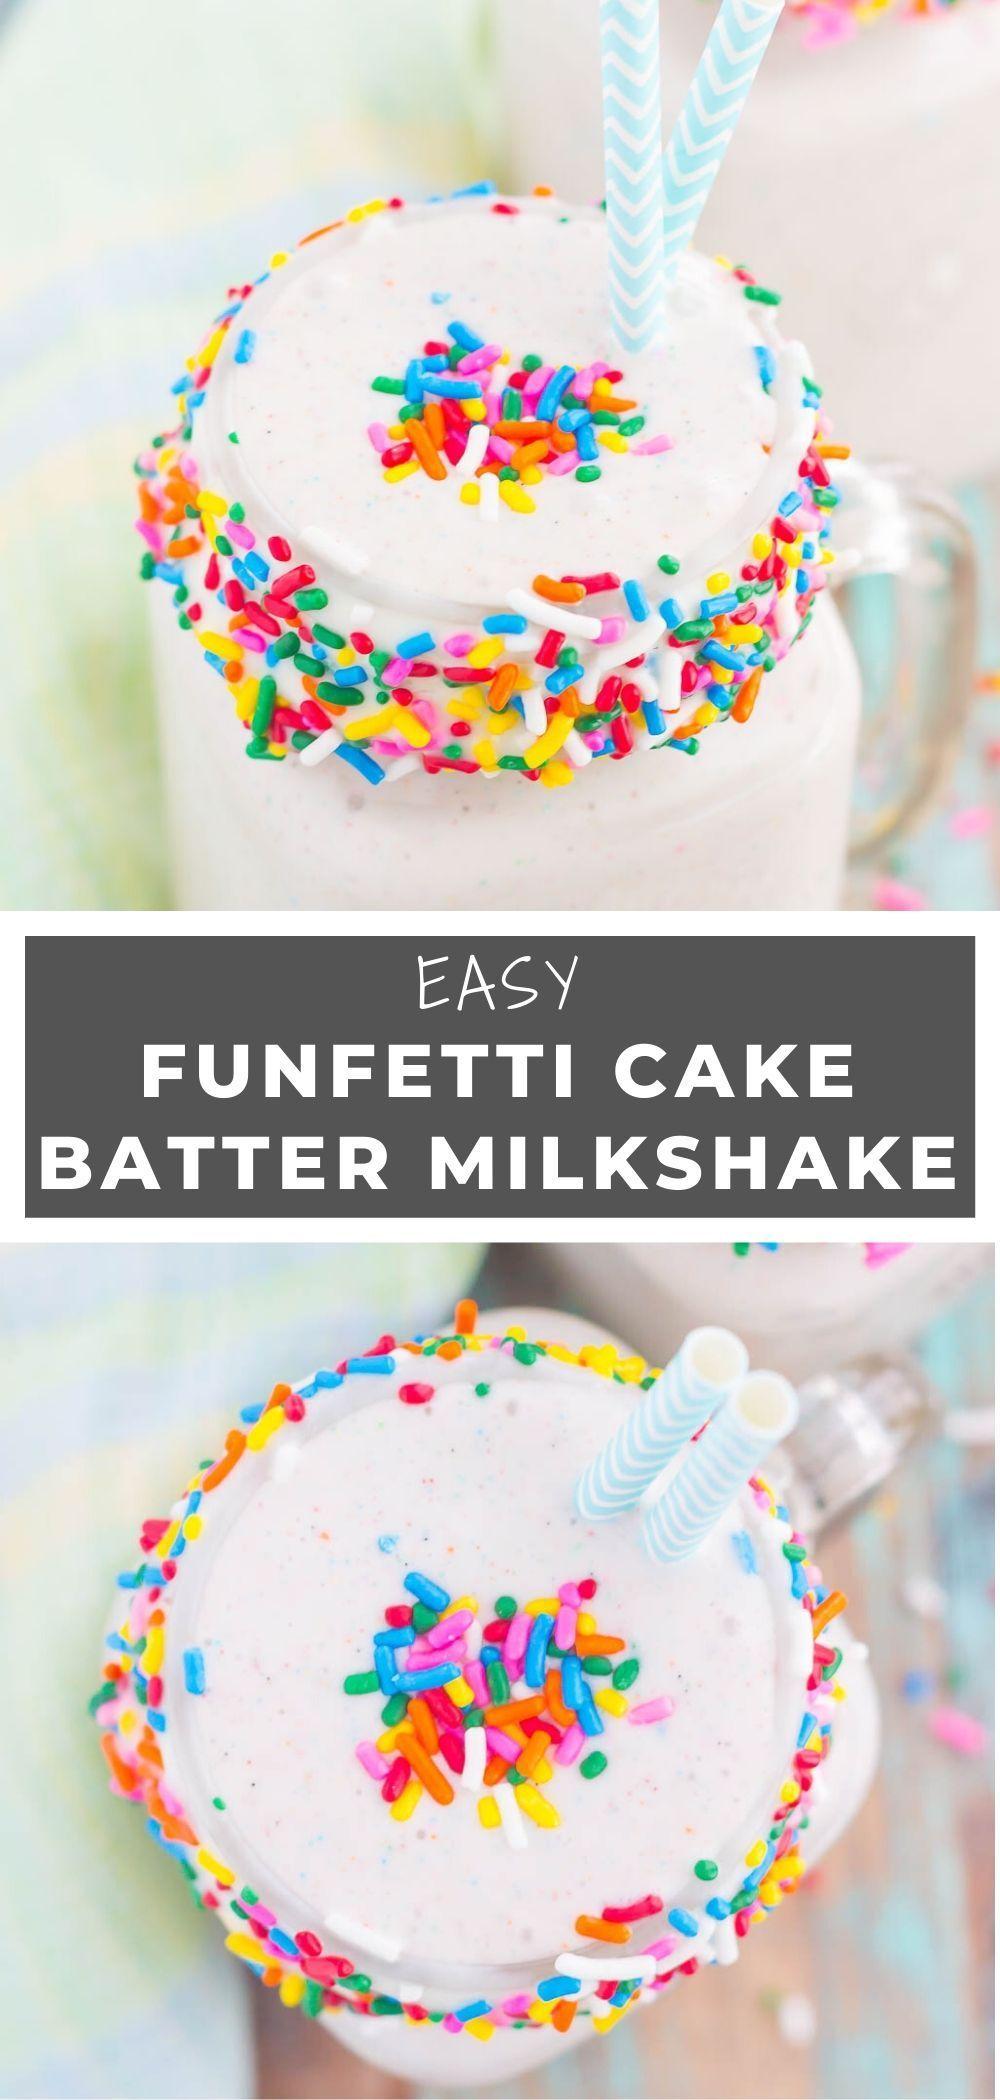 Creamy vanilla ice cream swirled with funfetti cake